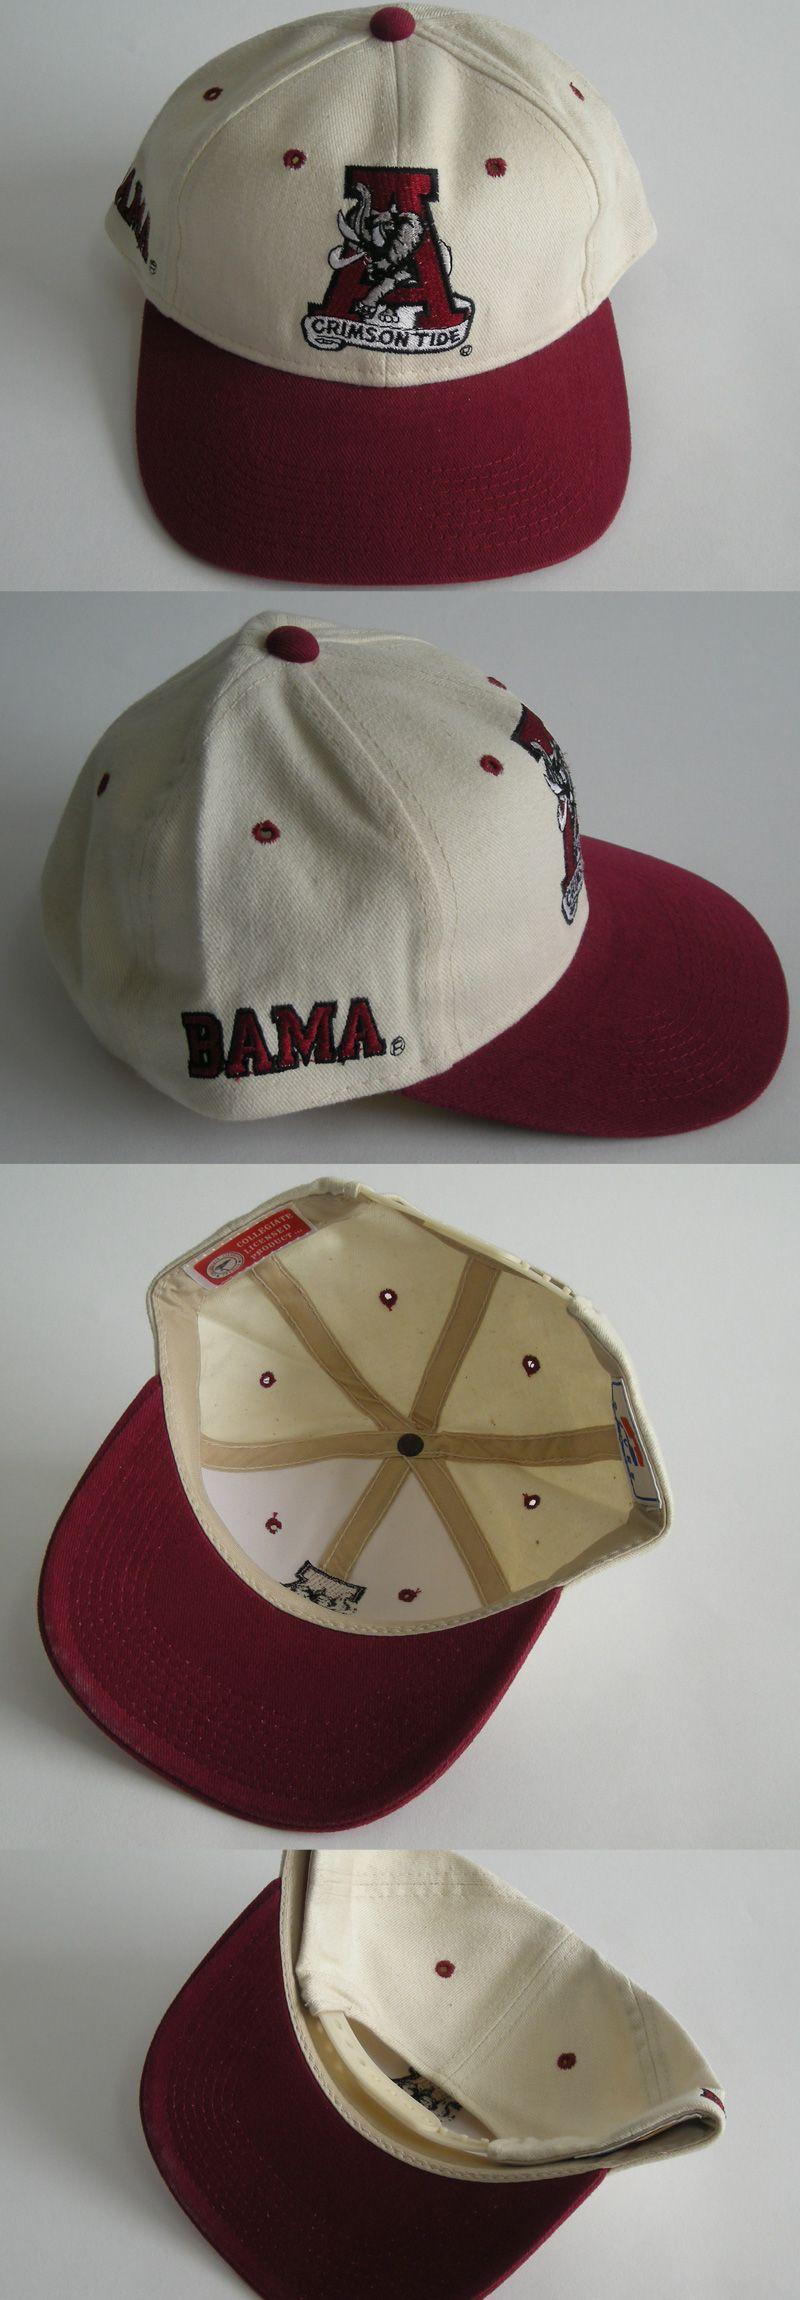 New Alabama Crimson Tide Rare Vintage Snapback Caps Hats 1990s White